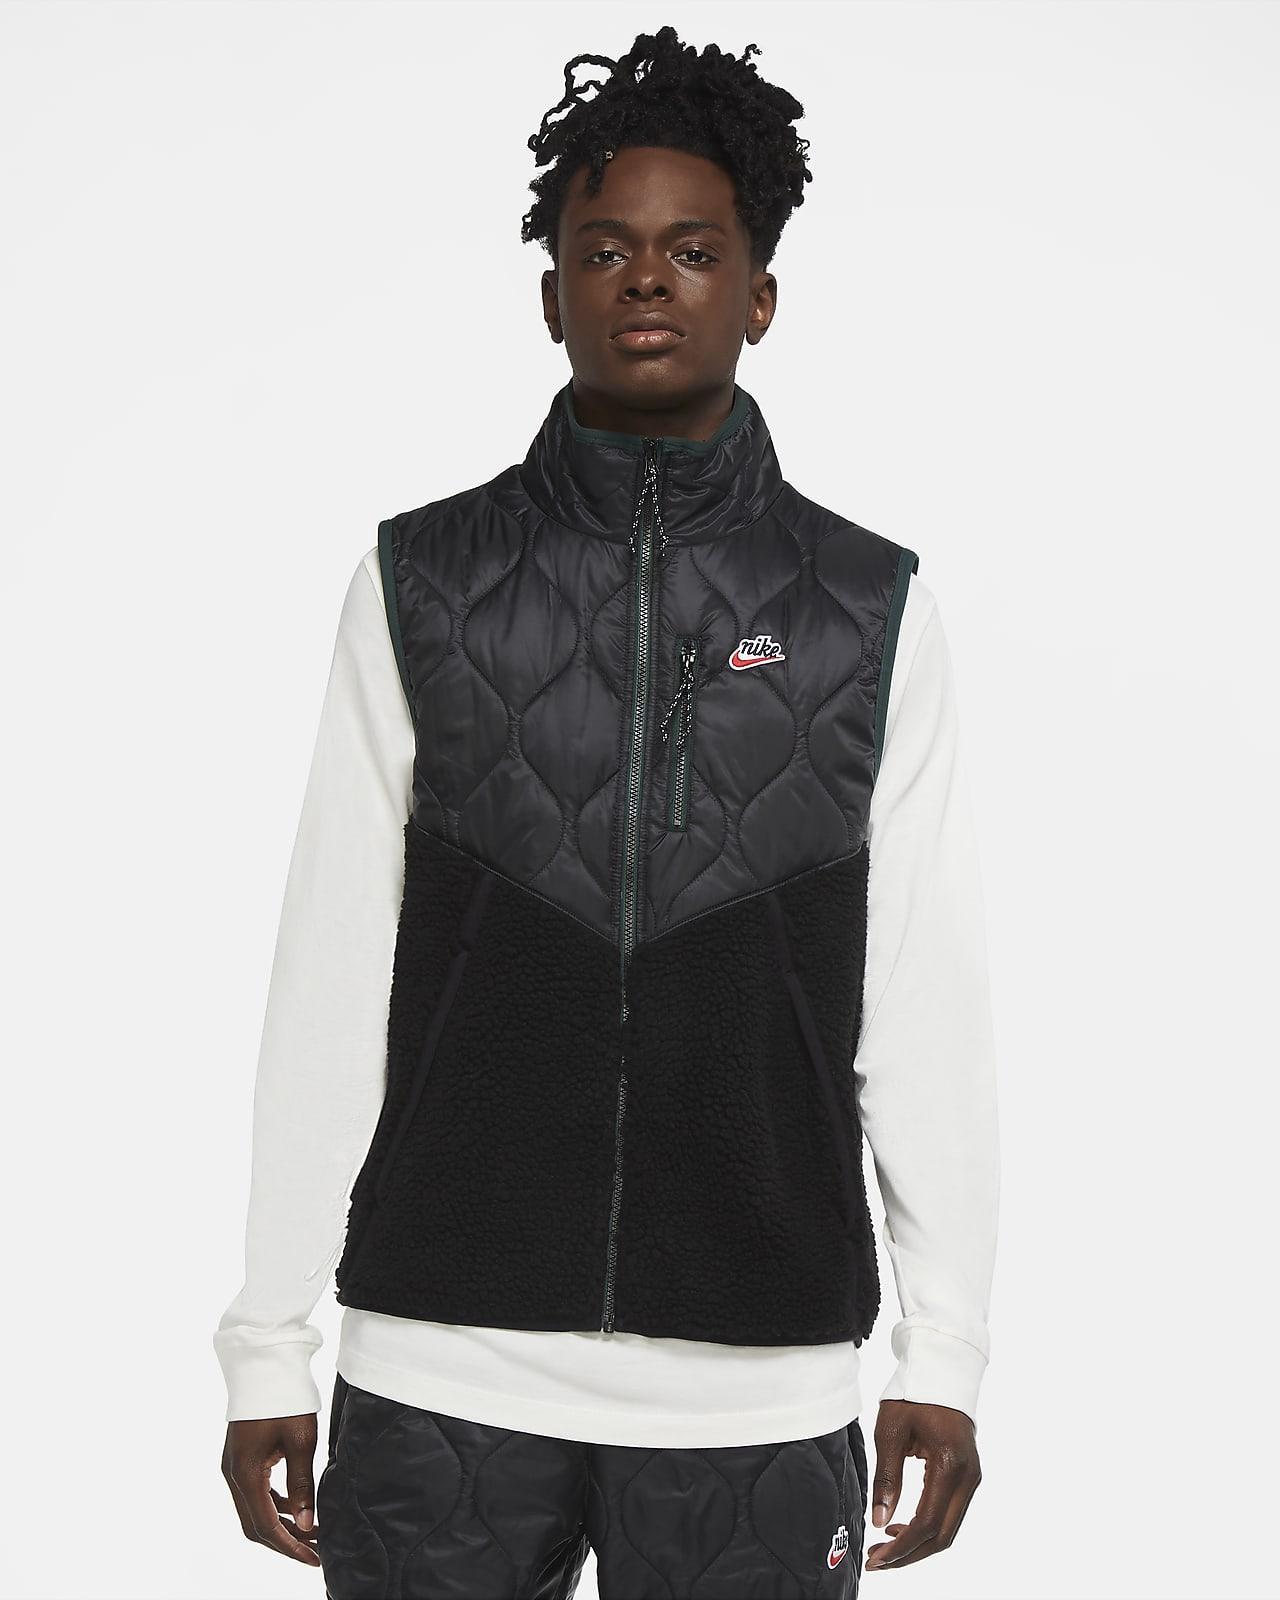 Groenlandia Vivienda Expectativa  Nike Sportswear Heritage Men's Insulated Vest. Nike.com